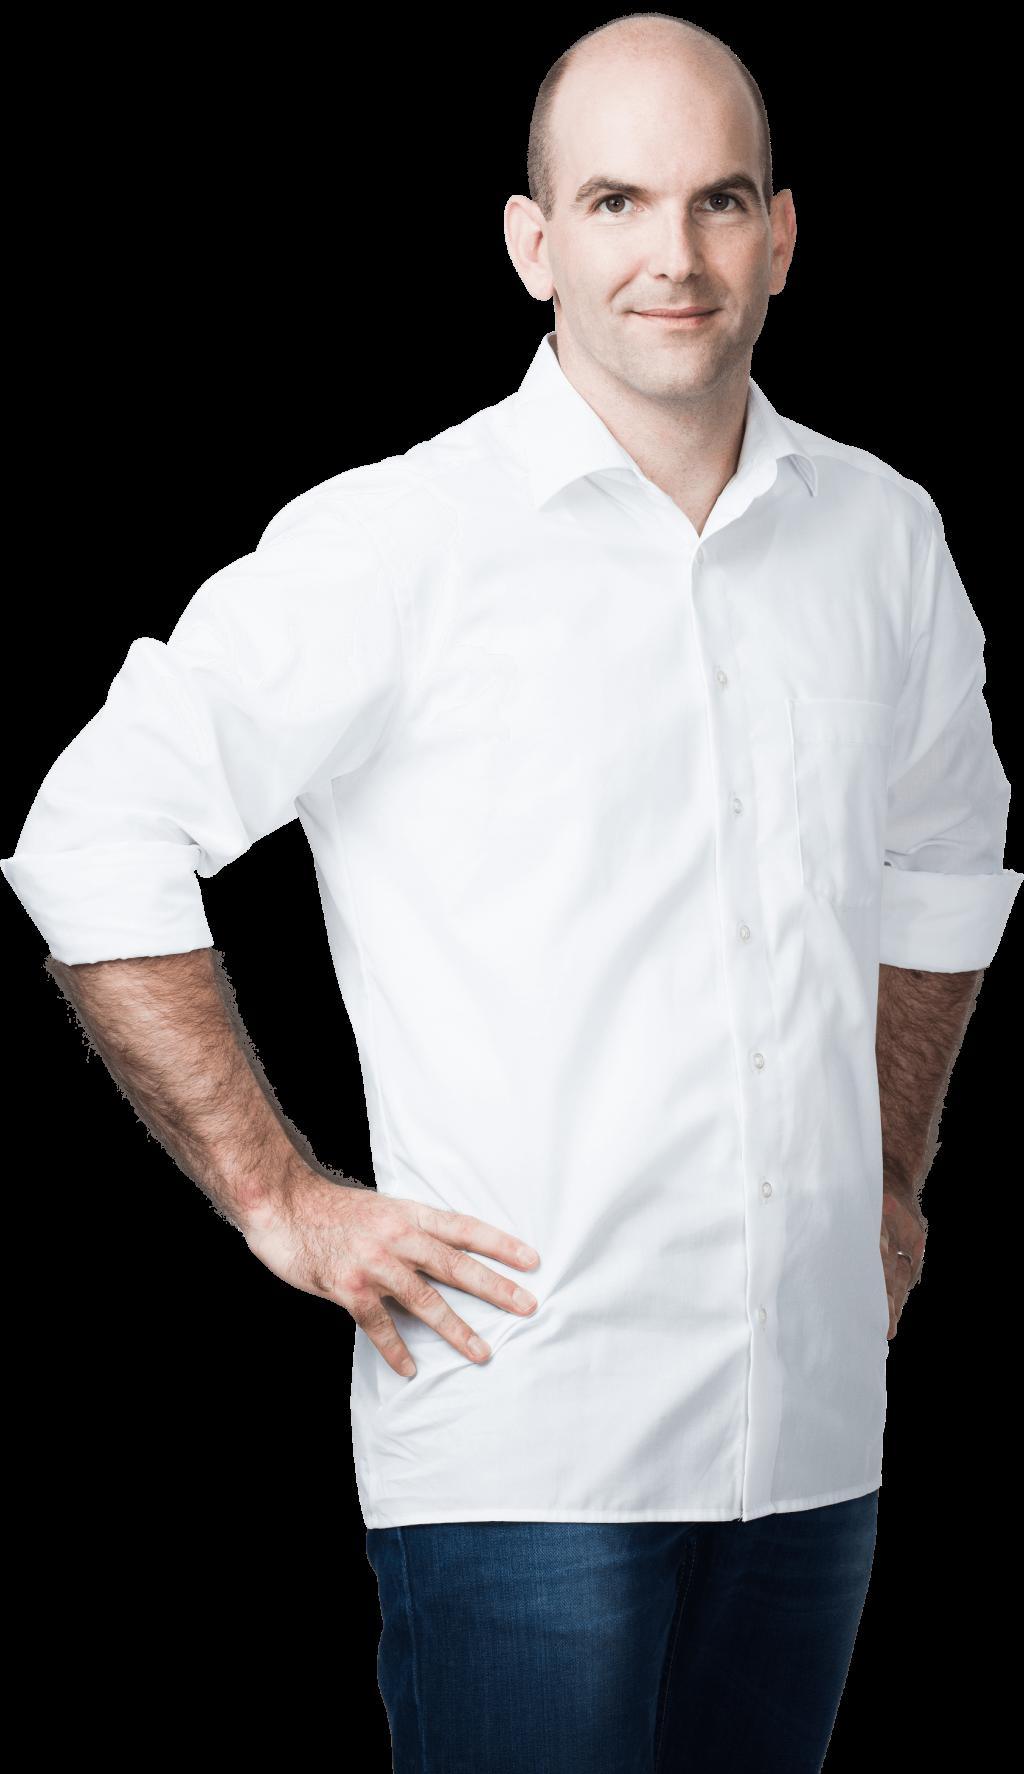 Dr. Paul Jirak